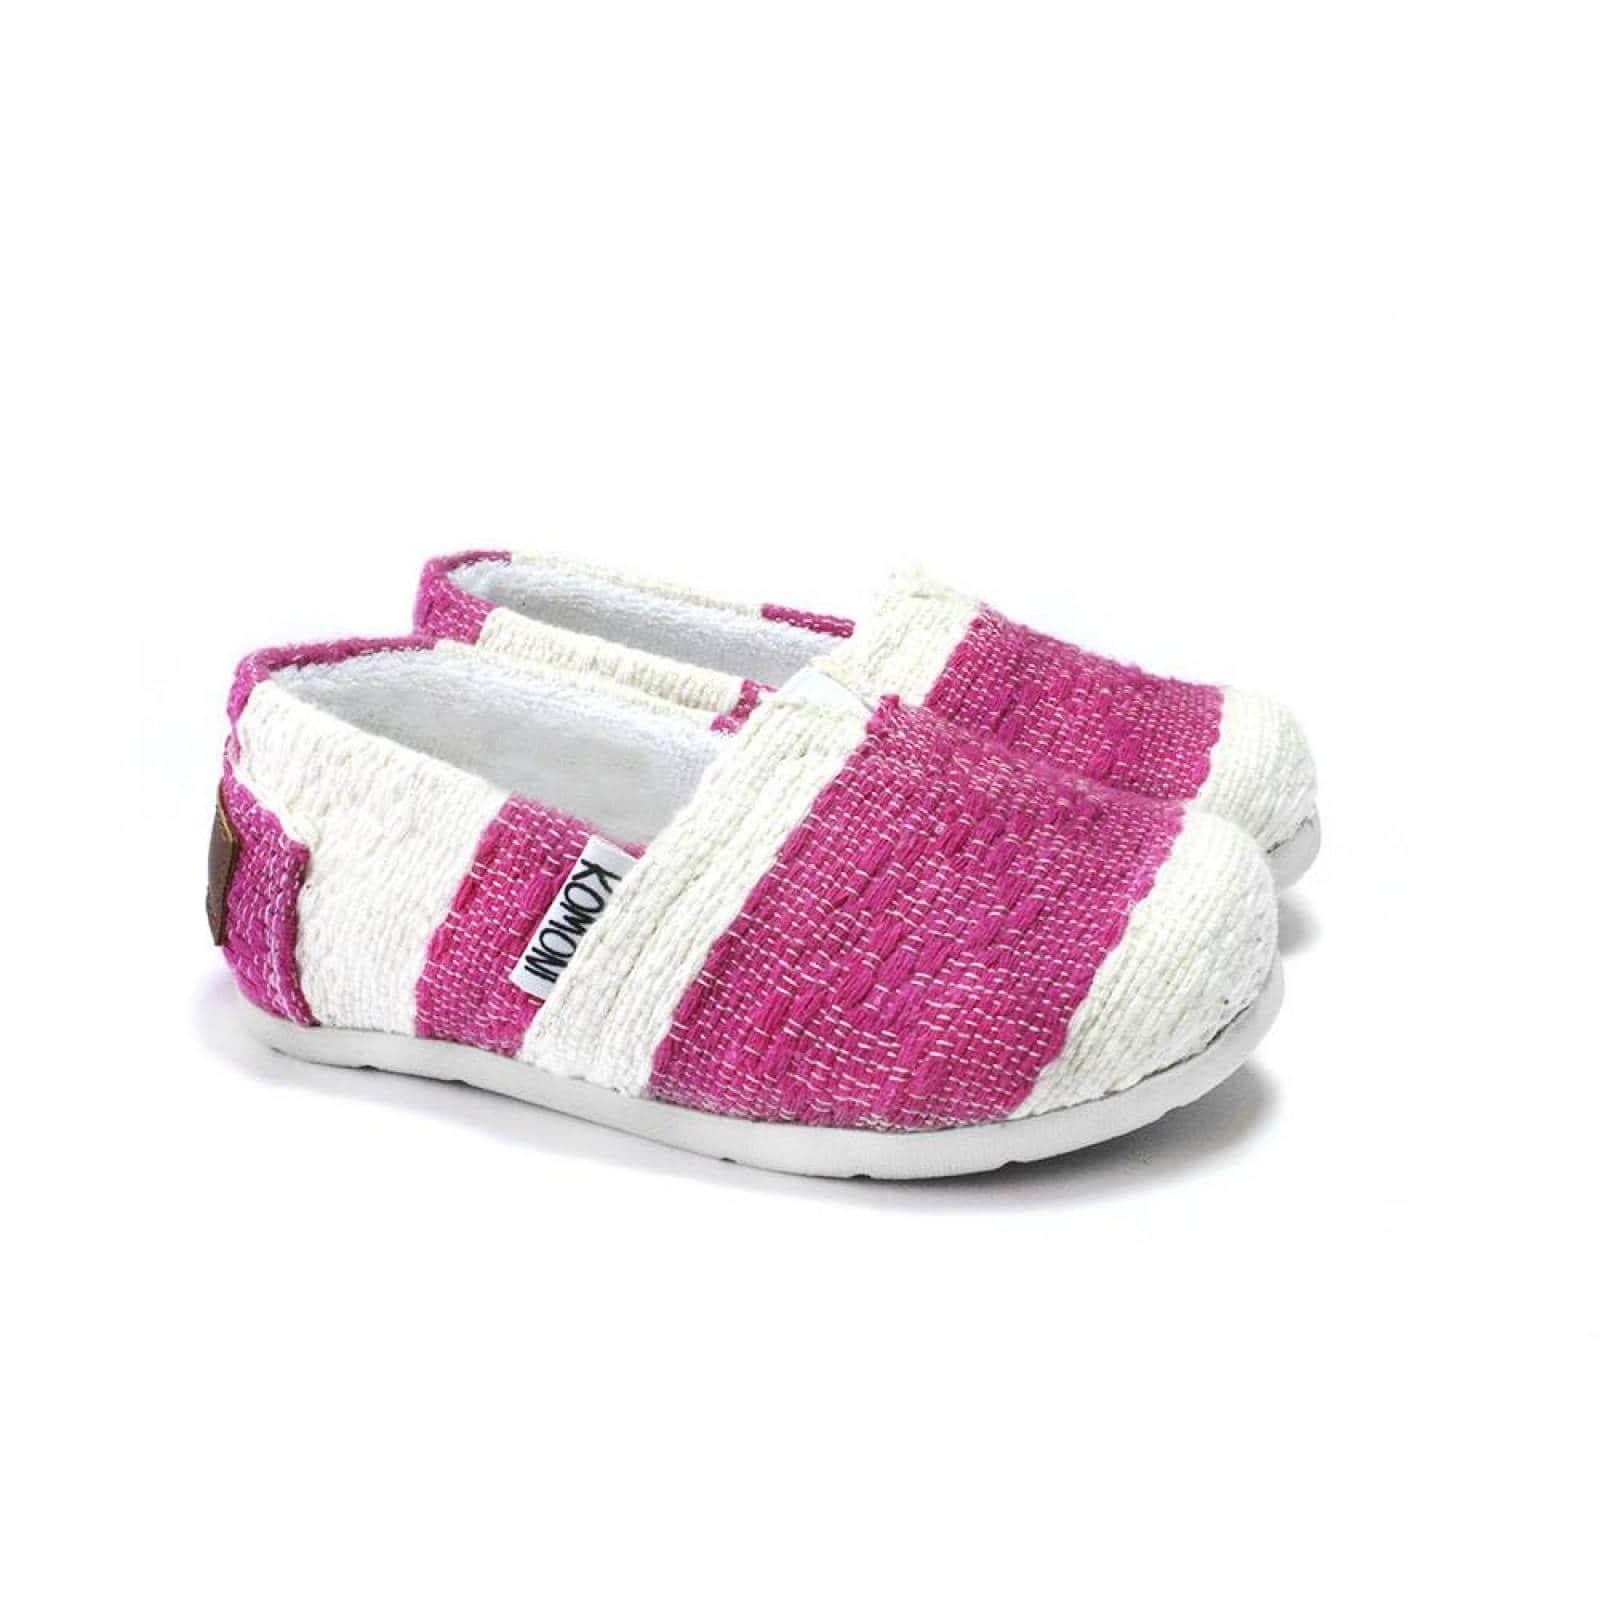 Zapato Alpargata Mini Jacinta Artesanal Tela Infantil Rosa Komoni Talla: 19